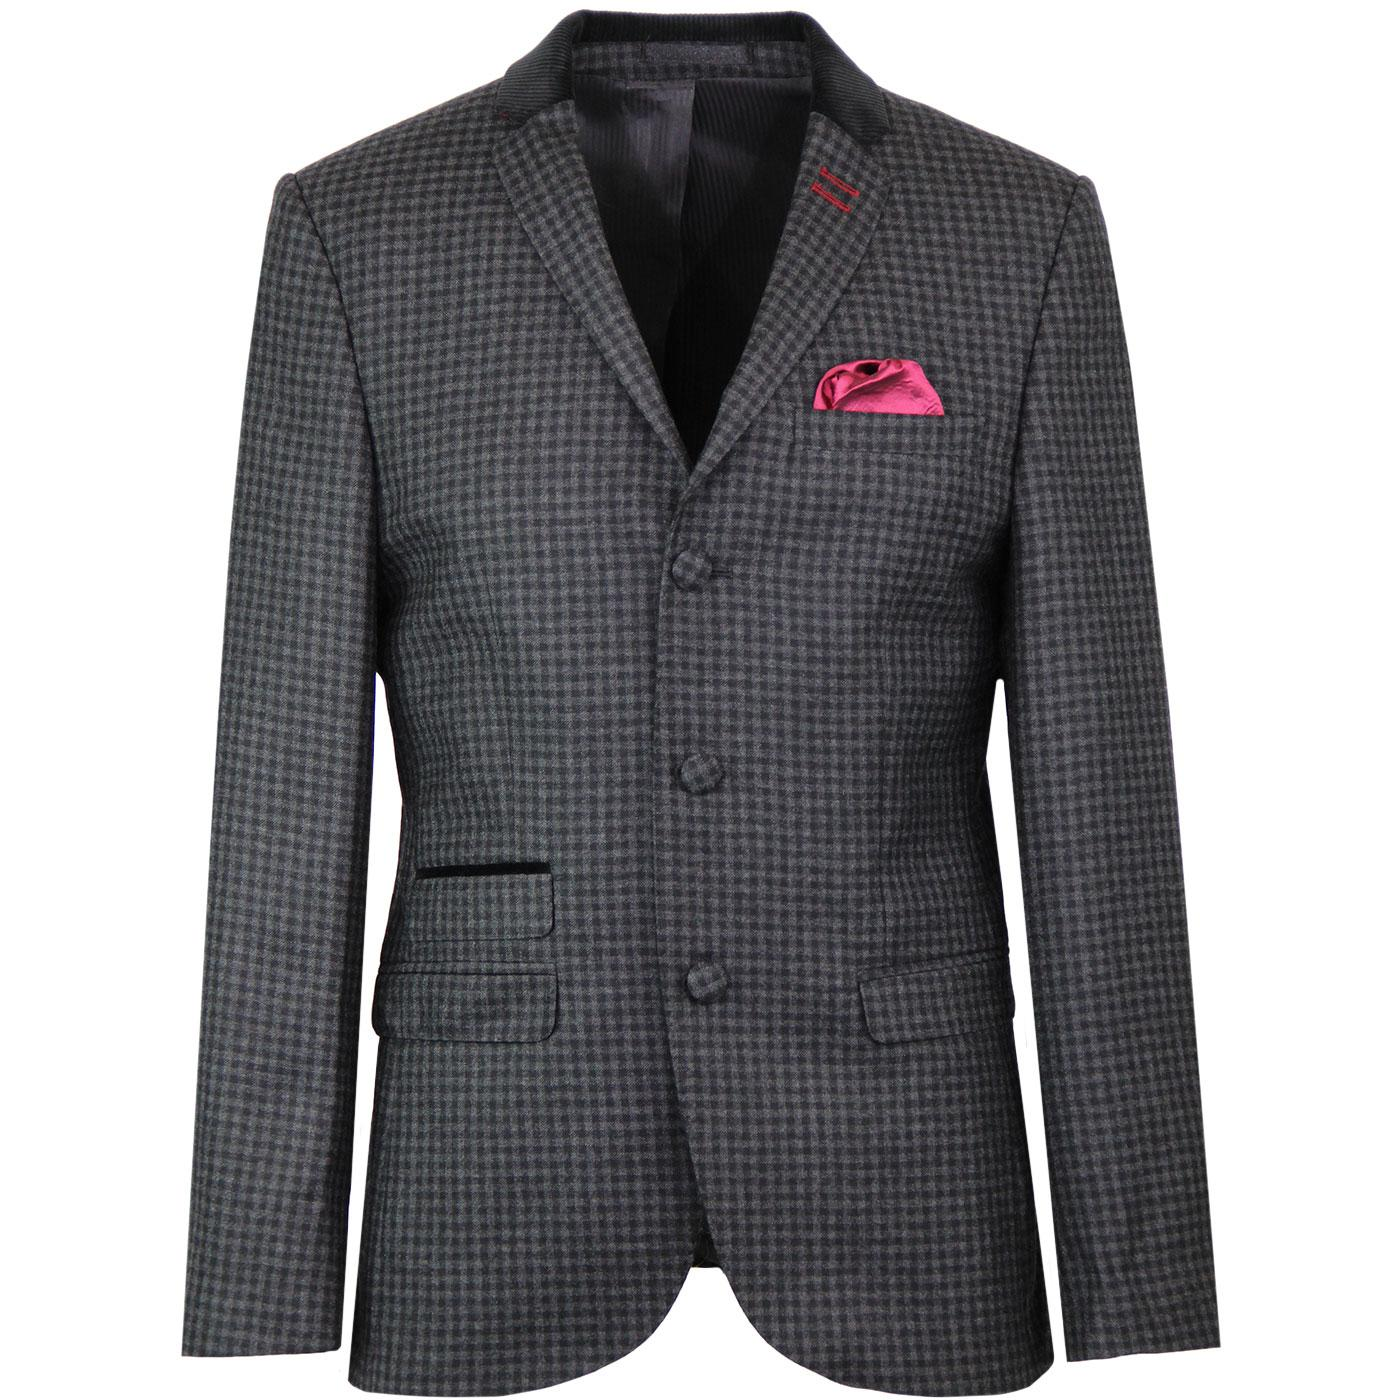 172852af01382 MADCAP ENGLAND Cord Collar Gingham Check Suit Jacket